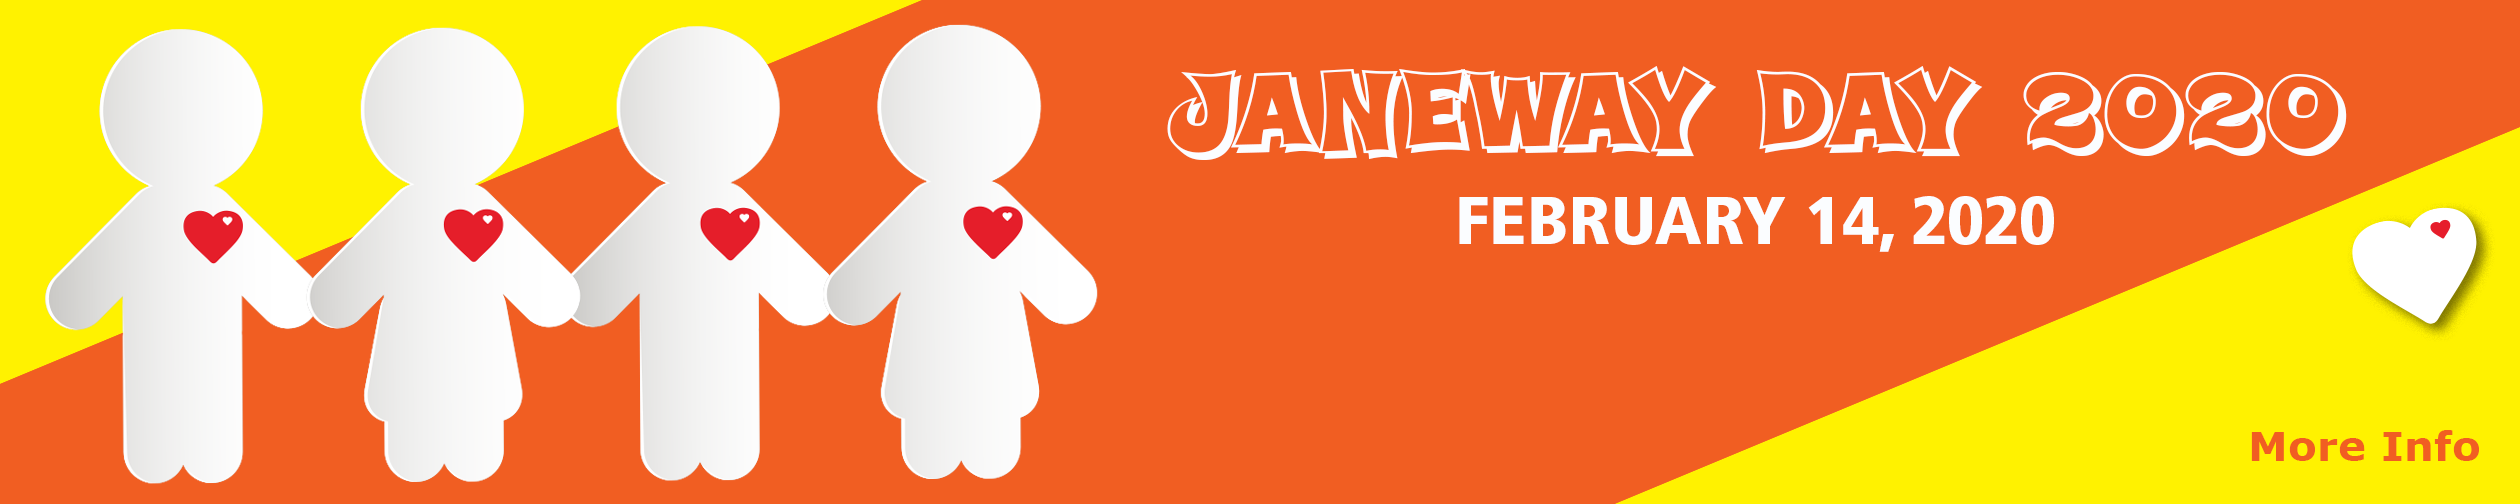 Janeway-Day-2020-slider2